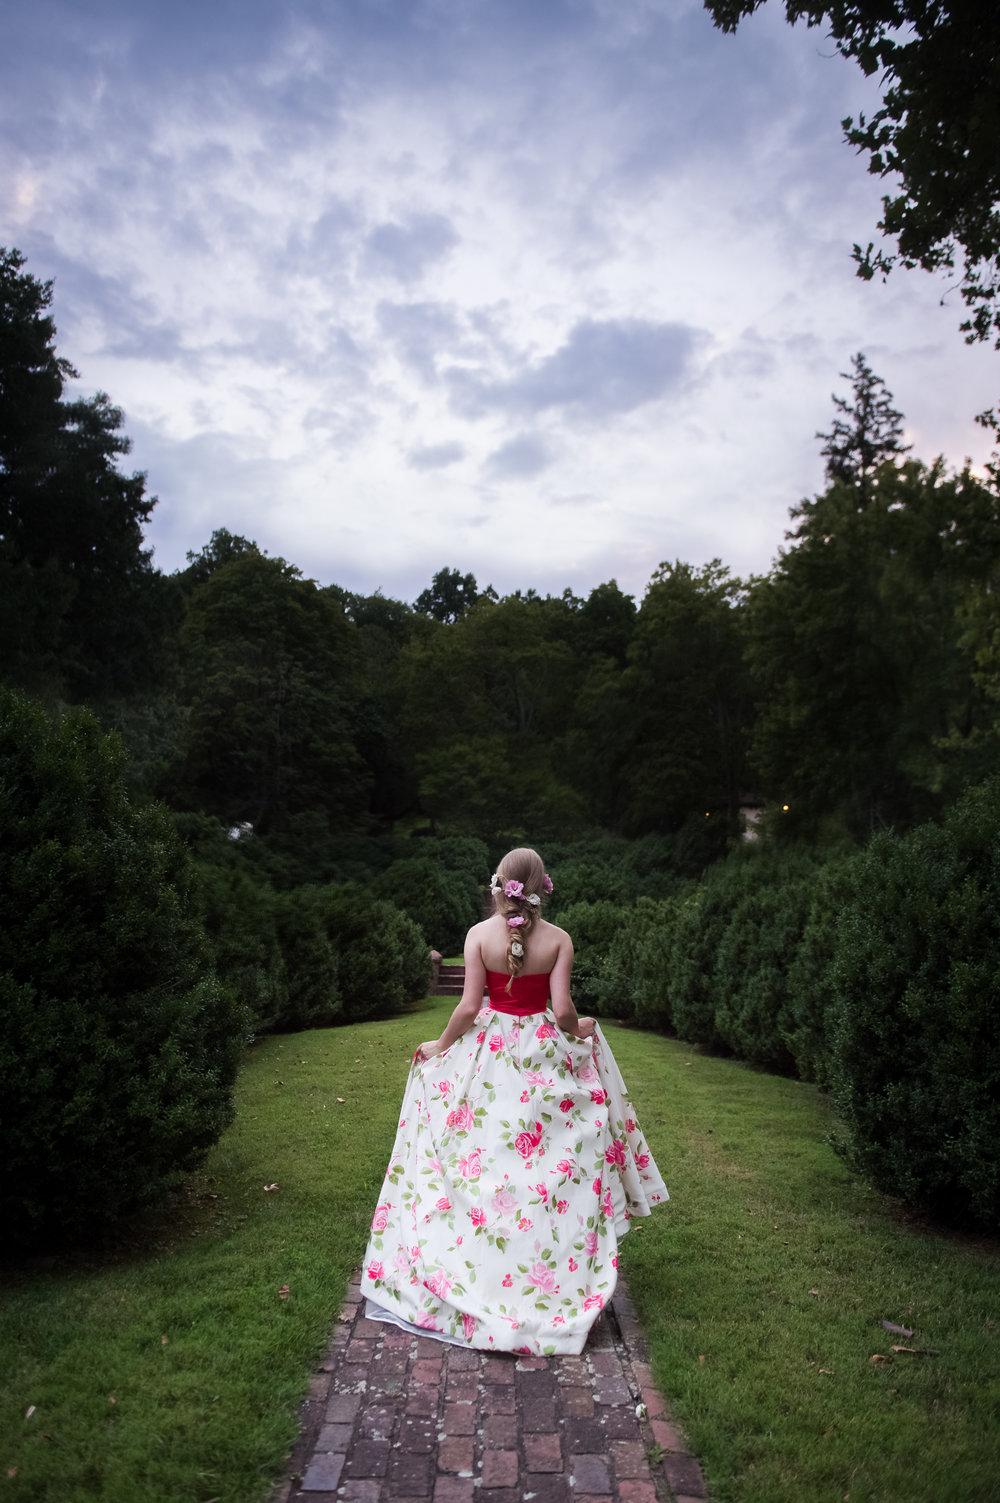 Lock and Co. Traci JD Medlock Washington DC Wedding Portrait Music Photography Videography Lifestyle Photographers Virginia Amanda.jpg